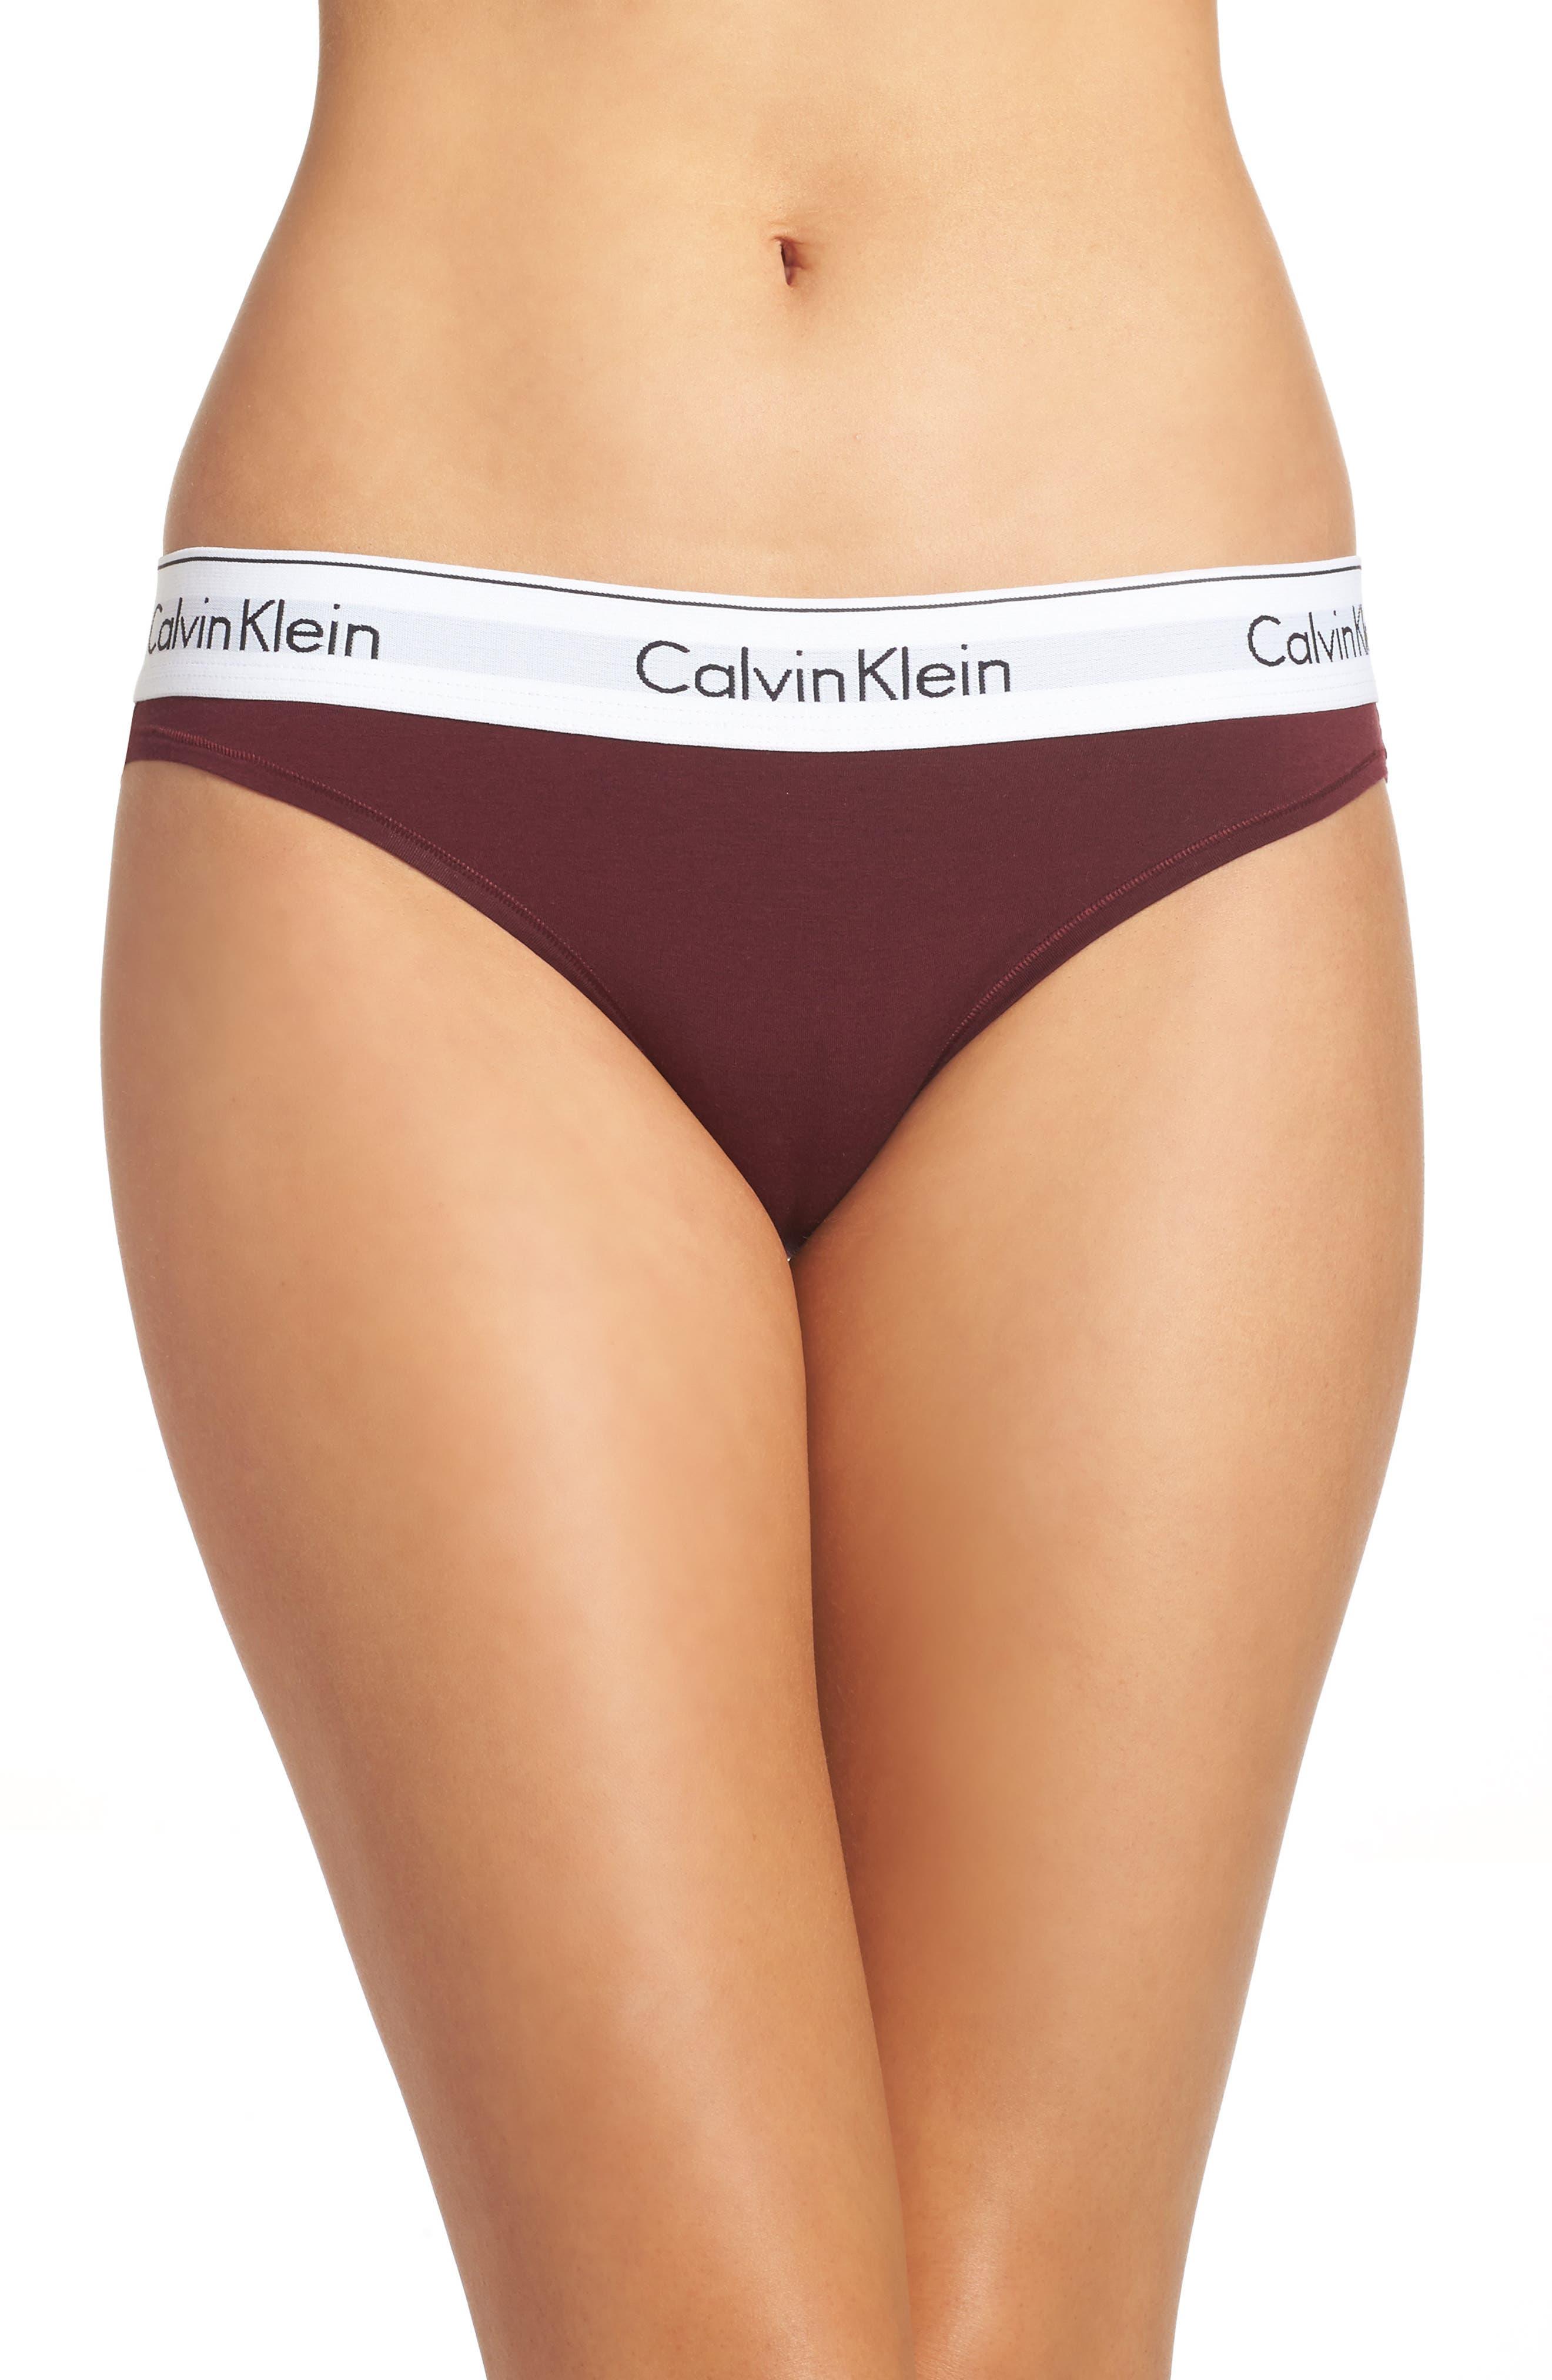 Main Image - Calvin Klein 'Modern Cotton Collection' Cotton Blend Bikini